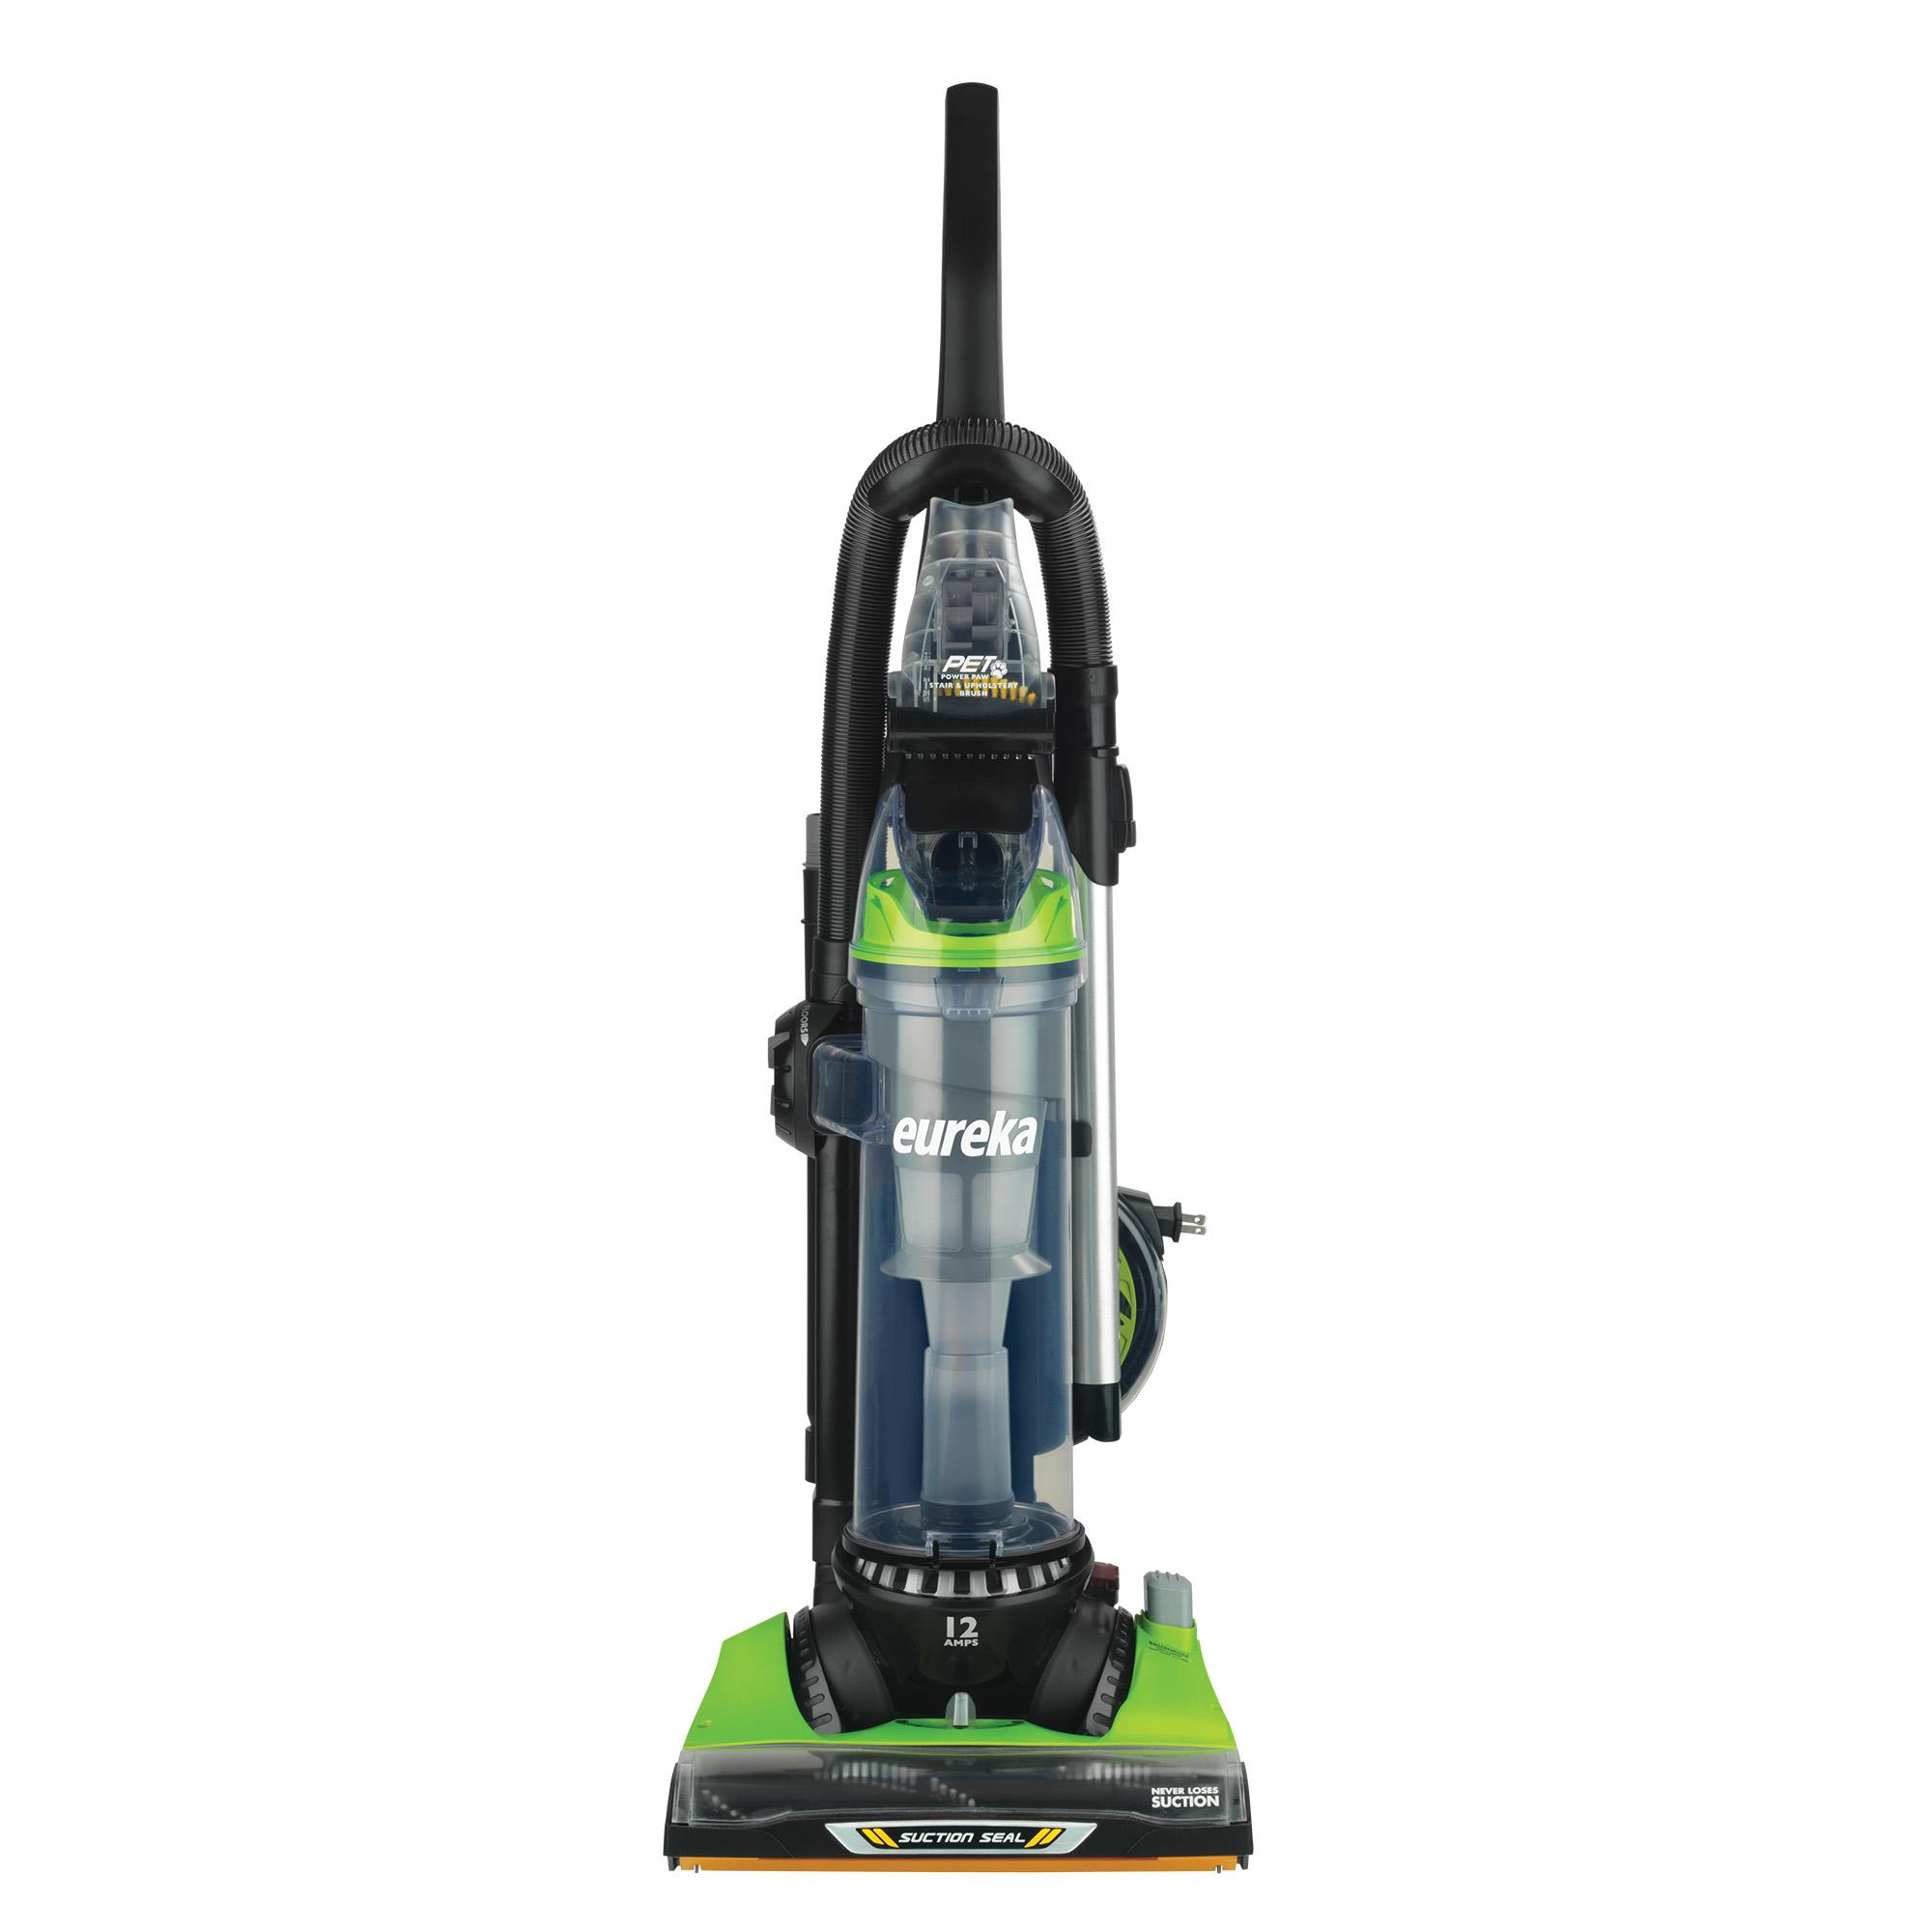 Eureka AS3104A SuctionSeal 20 PET Bagless Upright Vacuum